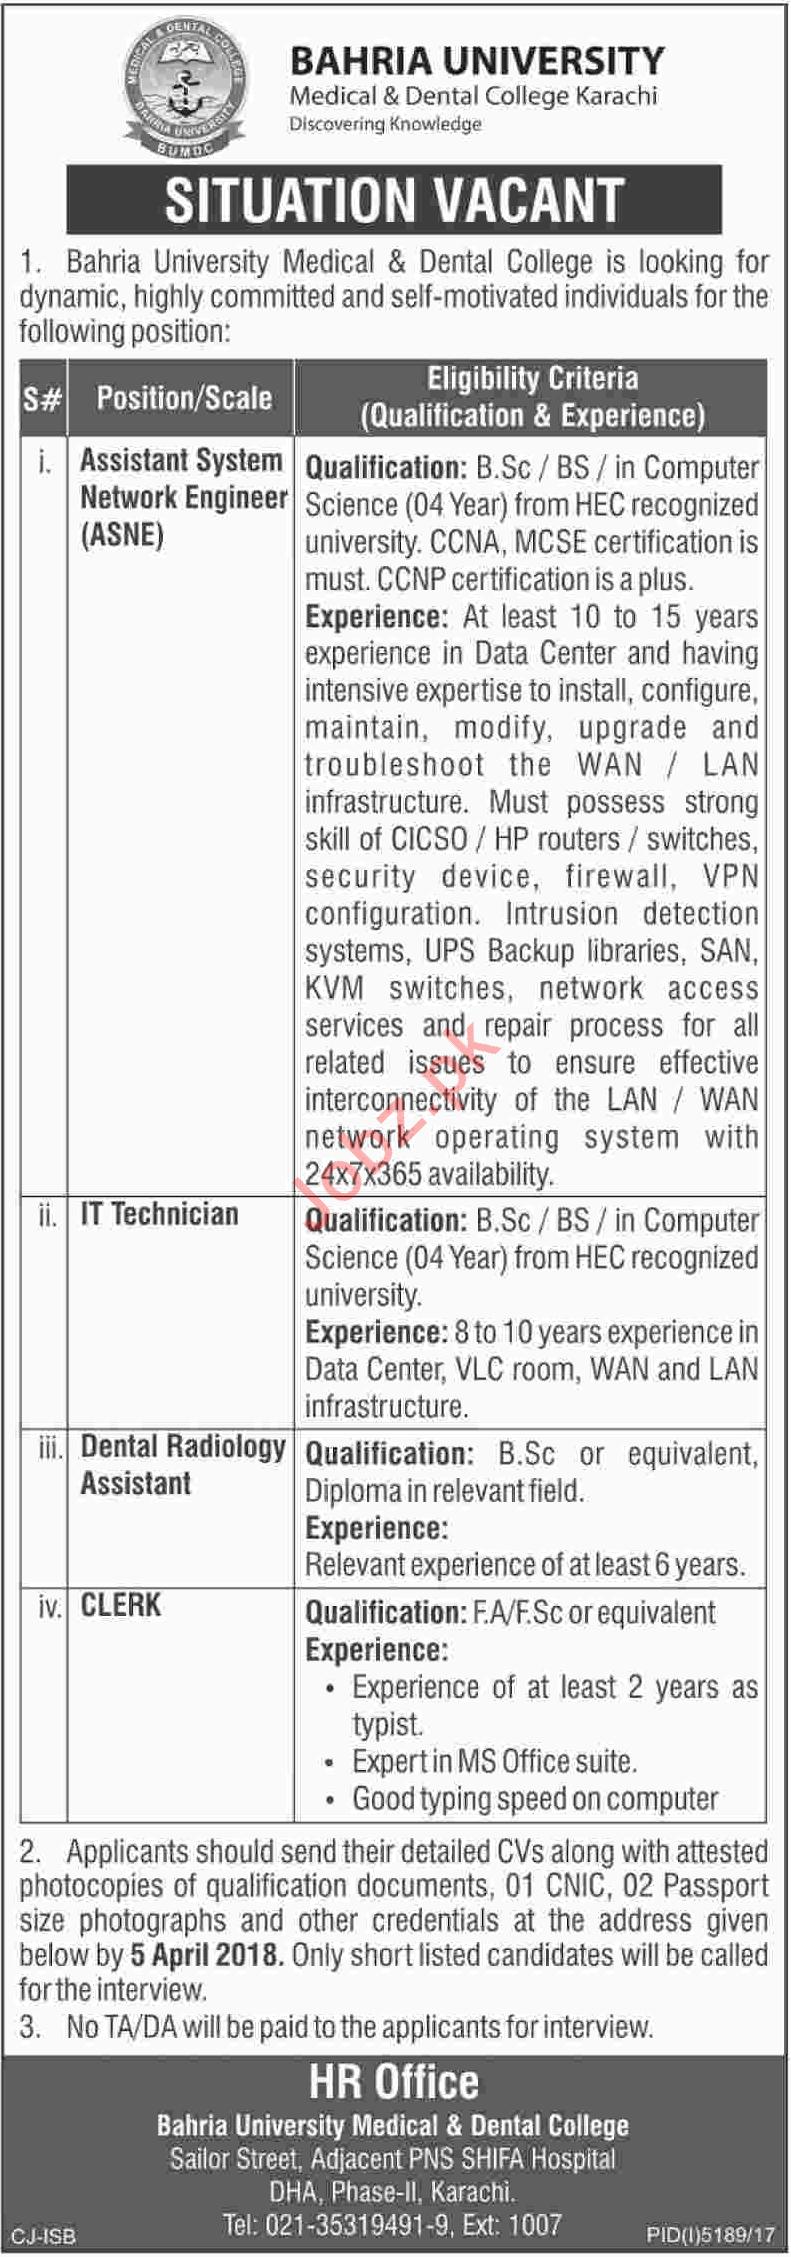 Bahria University Jobs ASNE, IT Technician, Assistant, Clerk